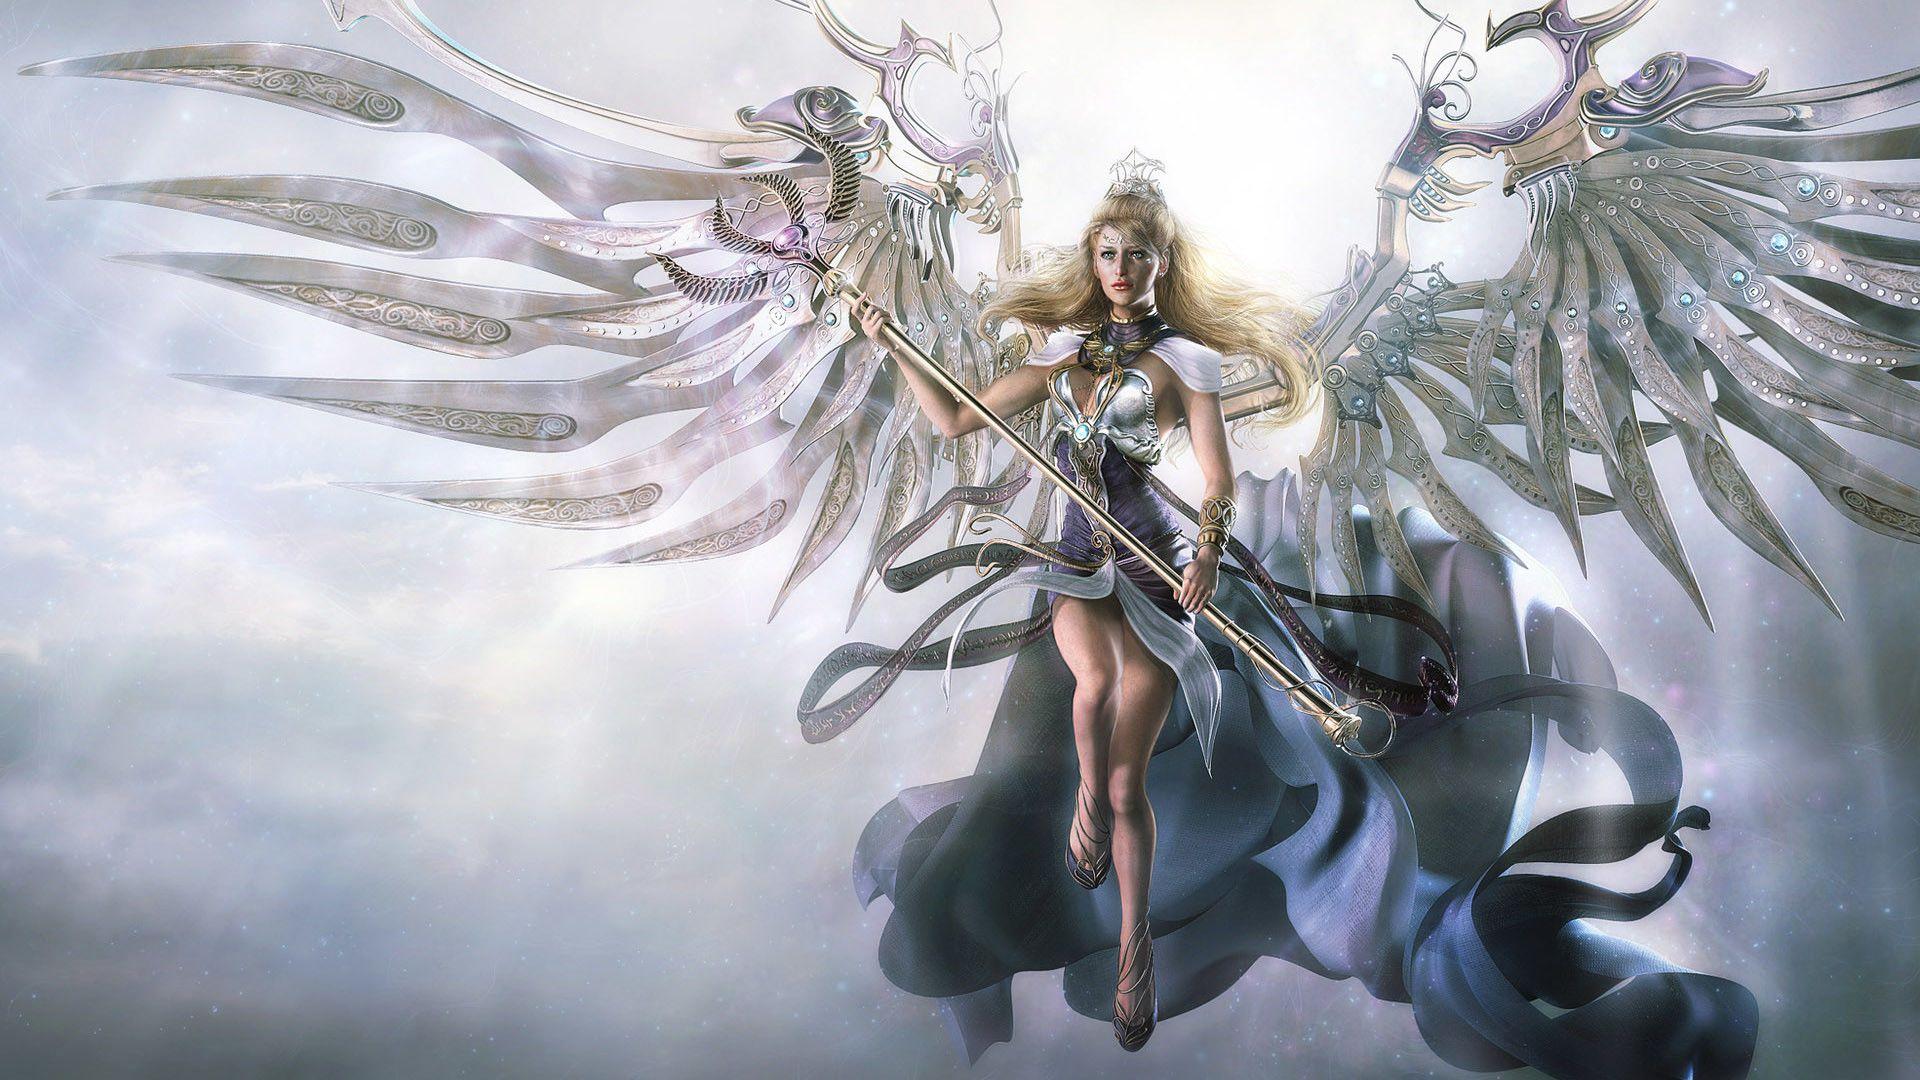 Fondos de pantalla de ángeles - FondosMil